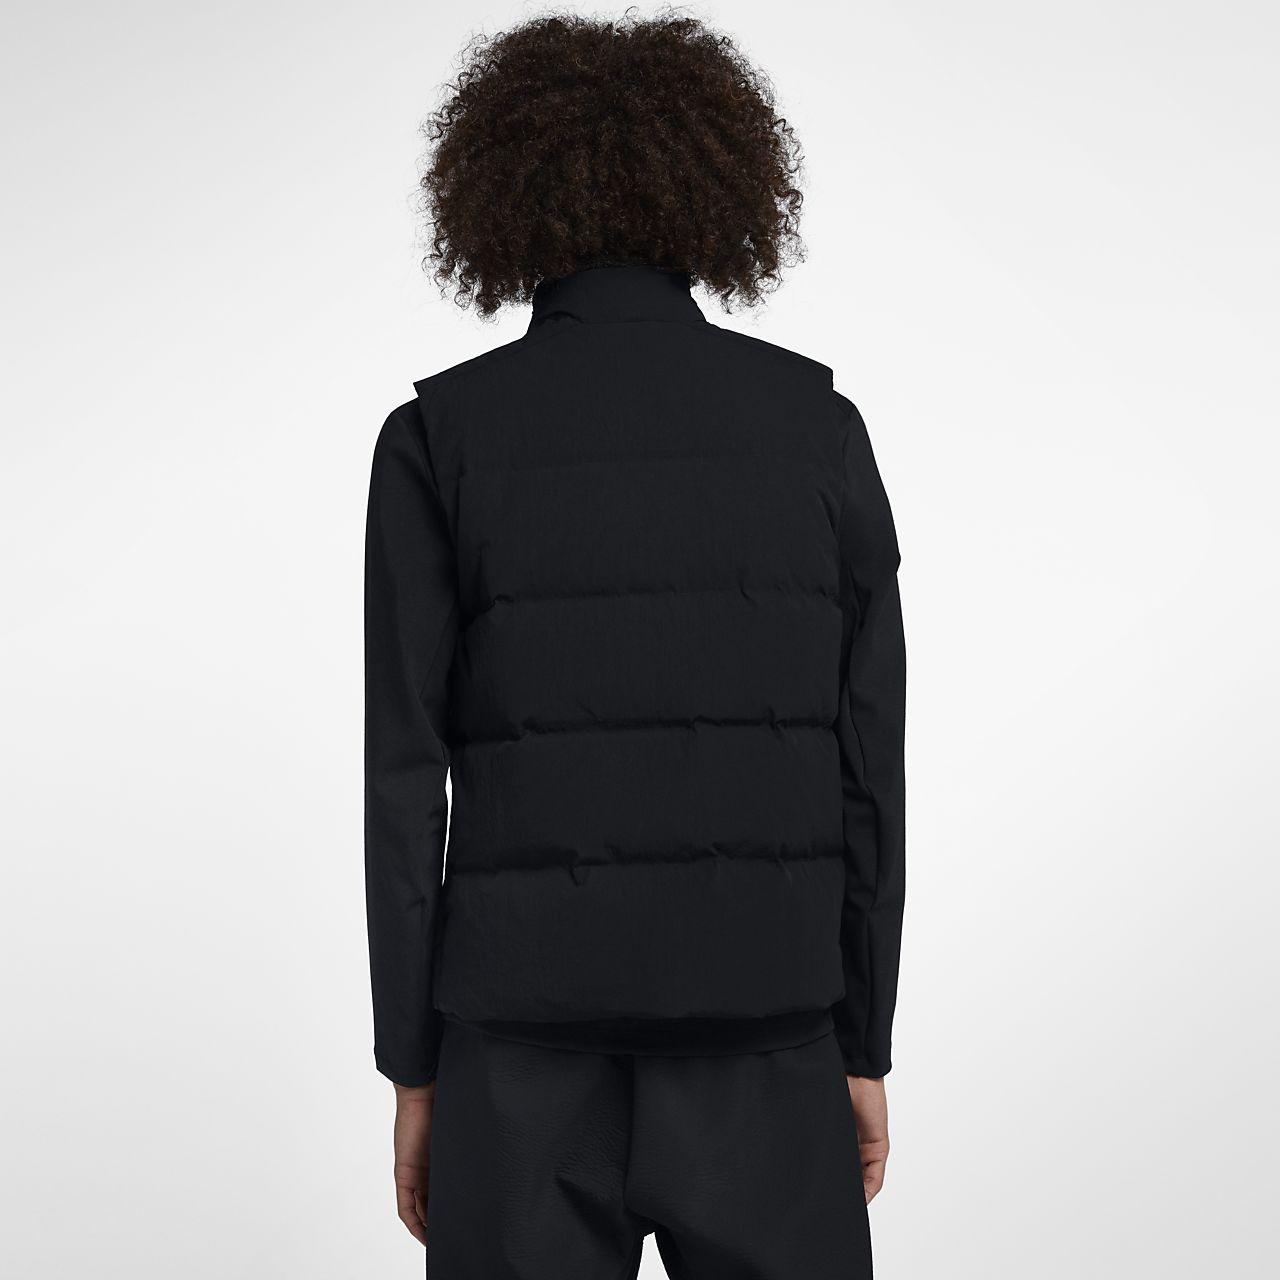 1d6223e8 Мужской жилет Nike Sportswear Tech Pack Down Fill. Nike.com RU